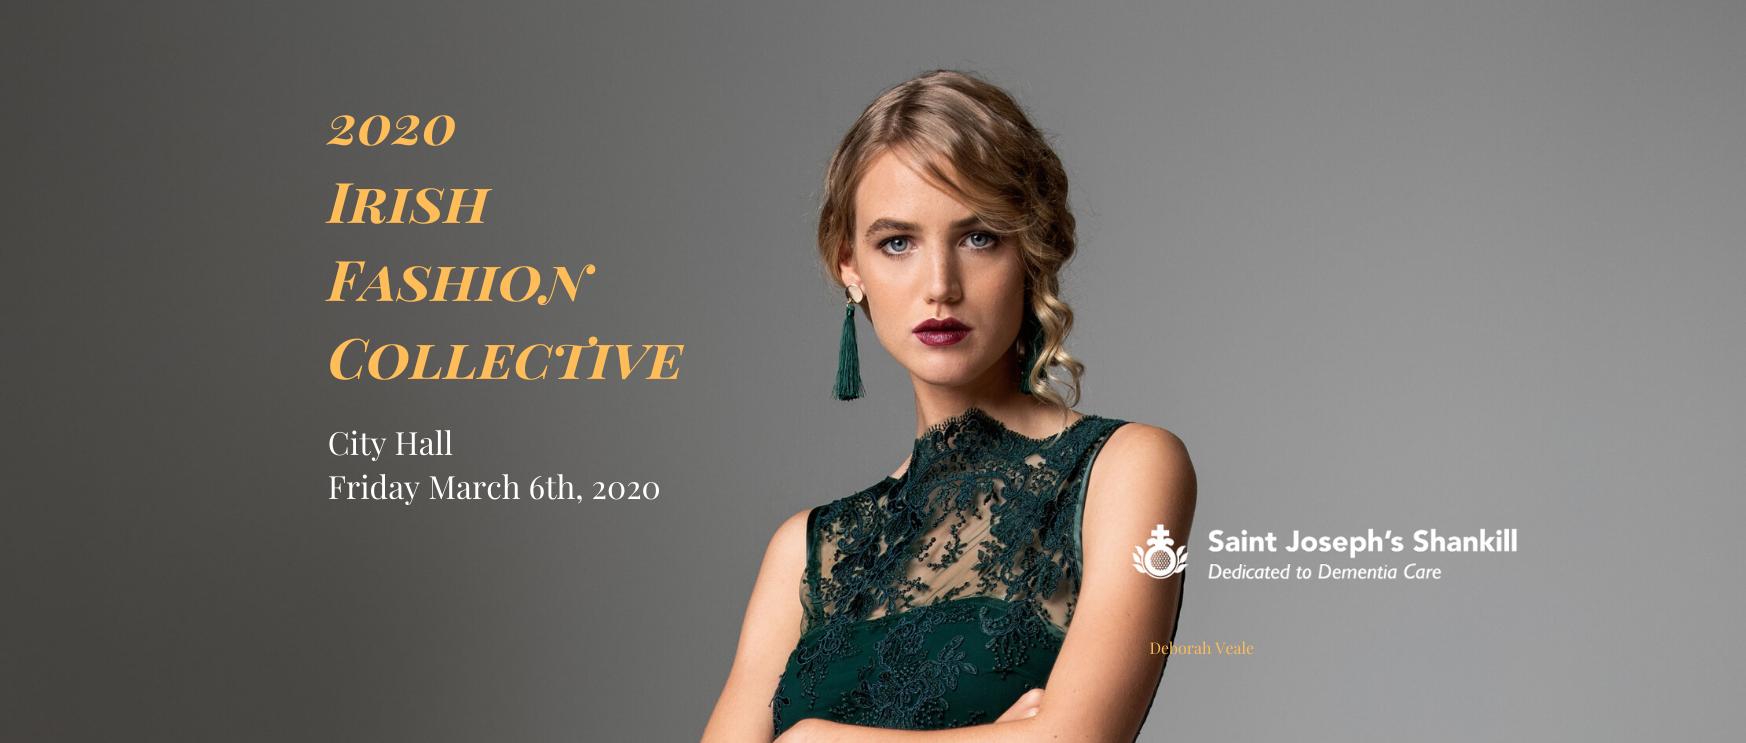 2020,Irish,Fashion,Collective